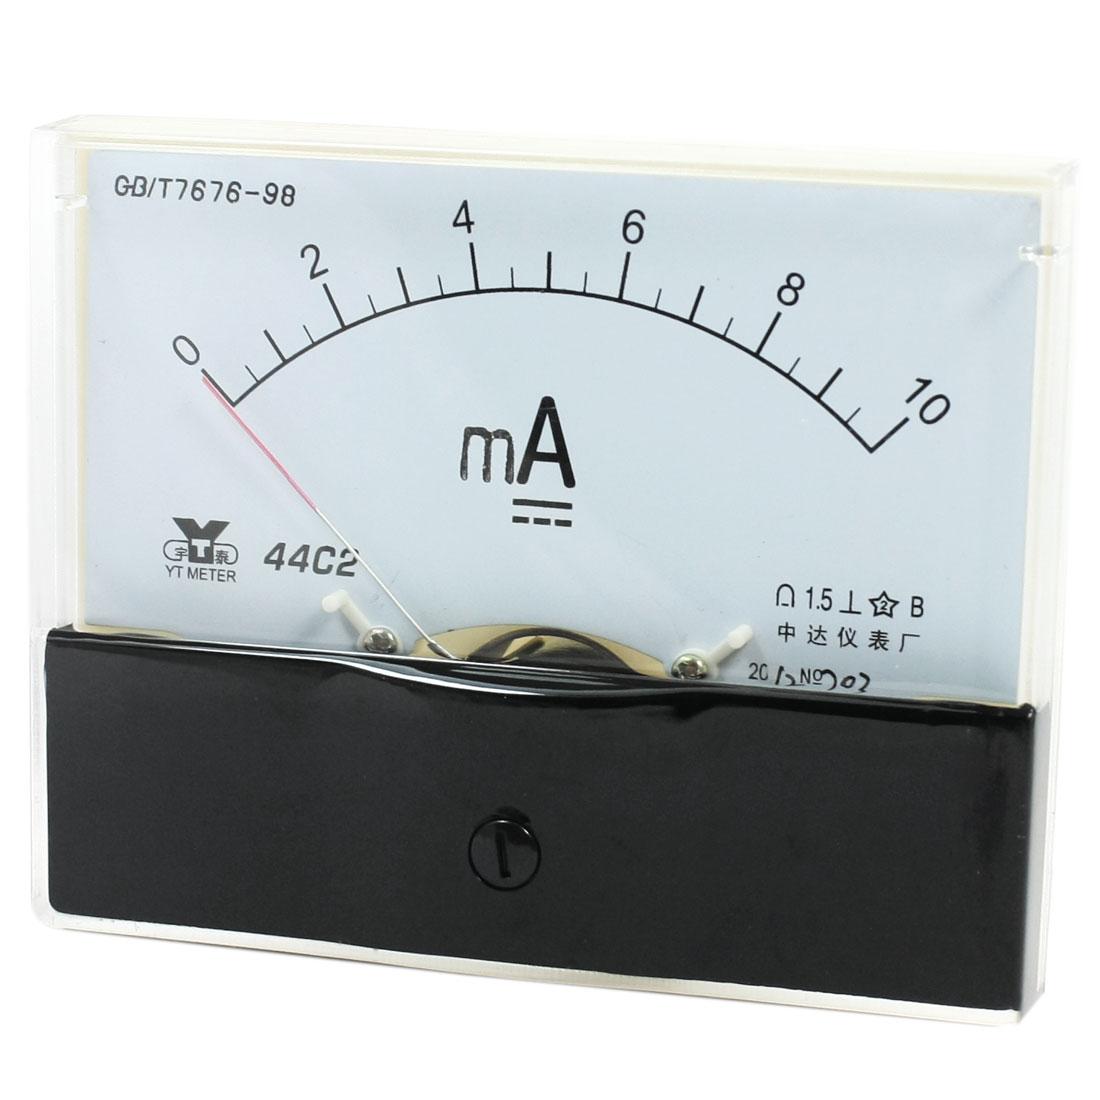 Rectangle Measurement Tool Analog Panel Ammeter Gauge DC 0 - 10mA Measuring Range 44C2